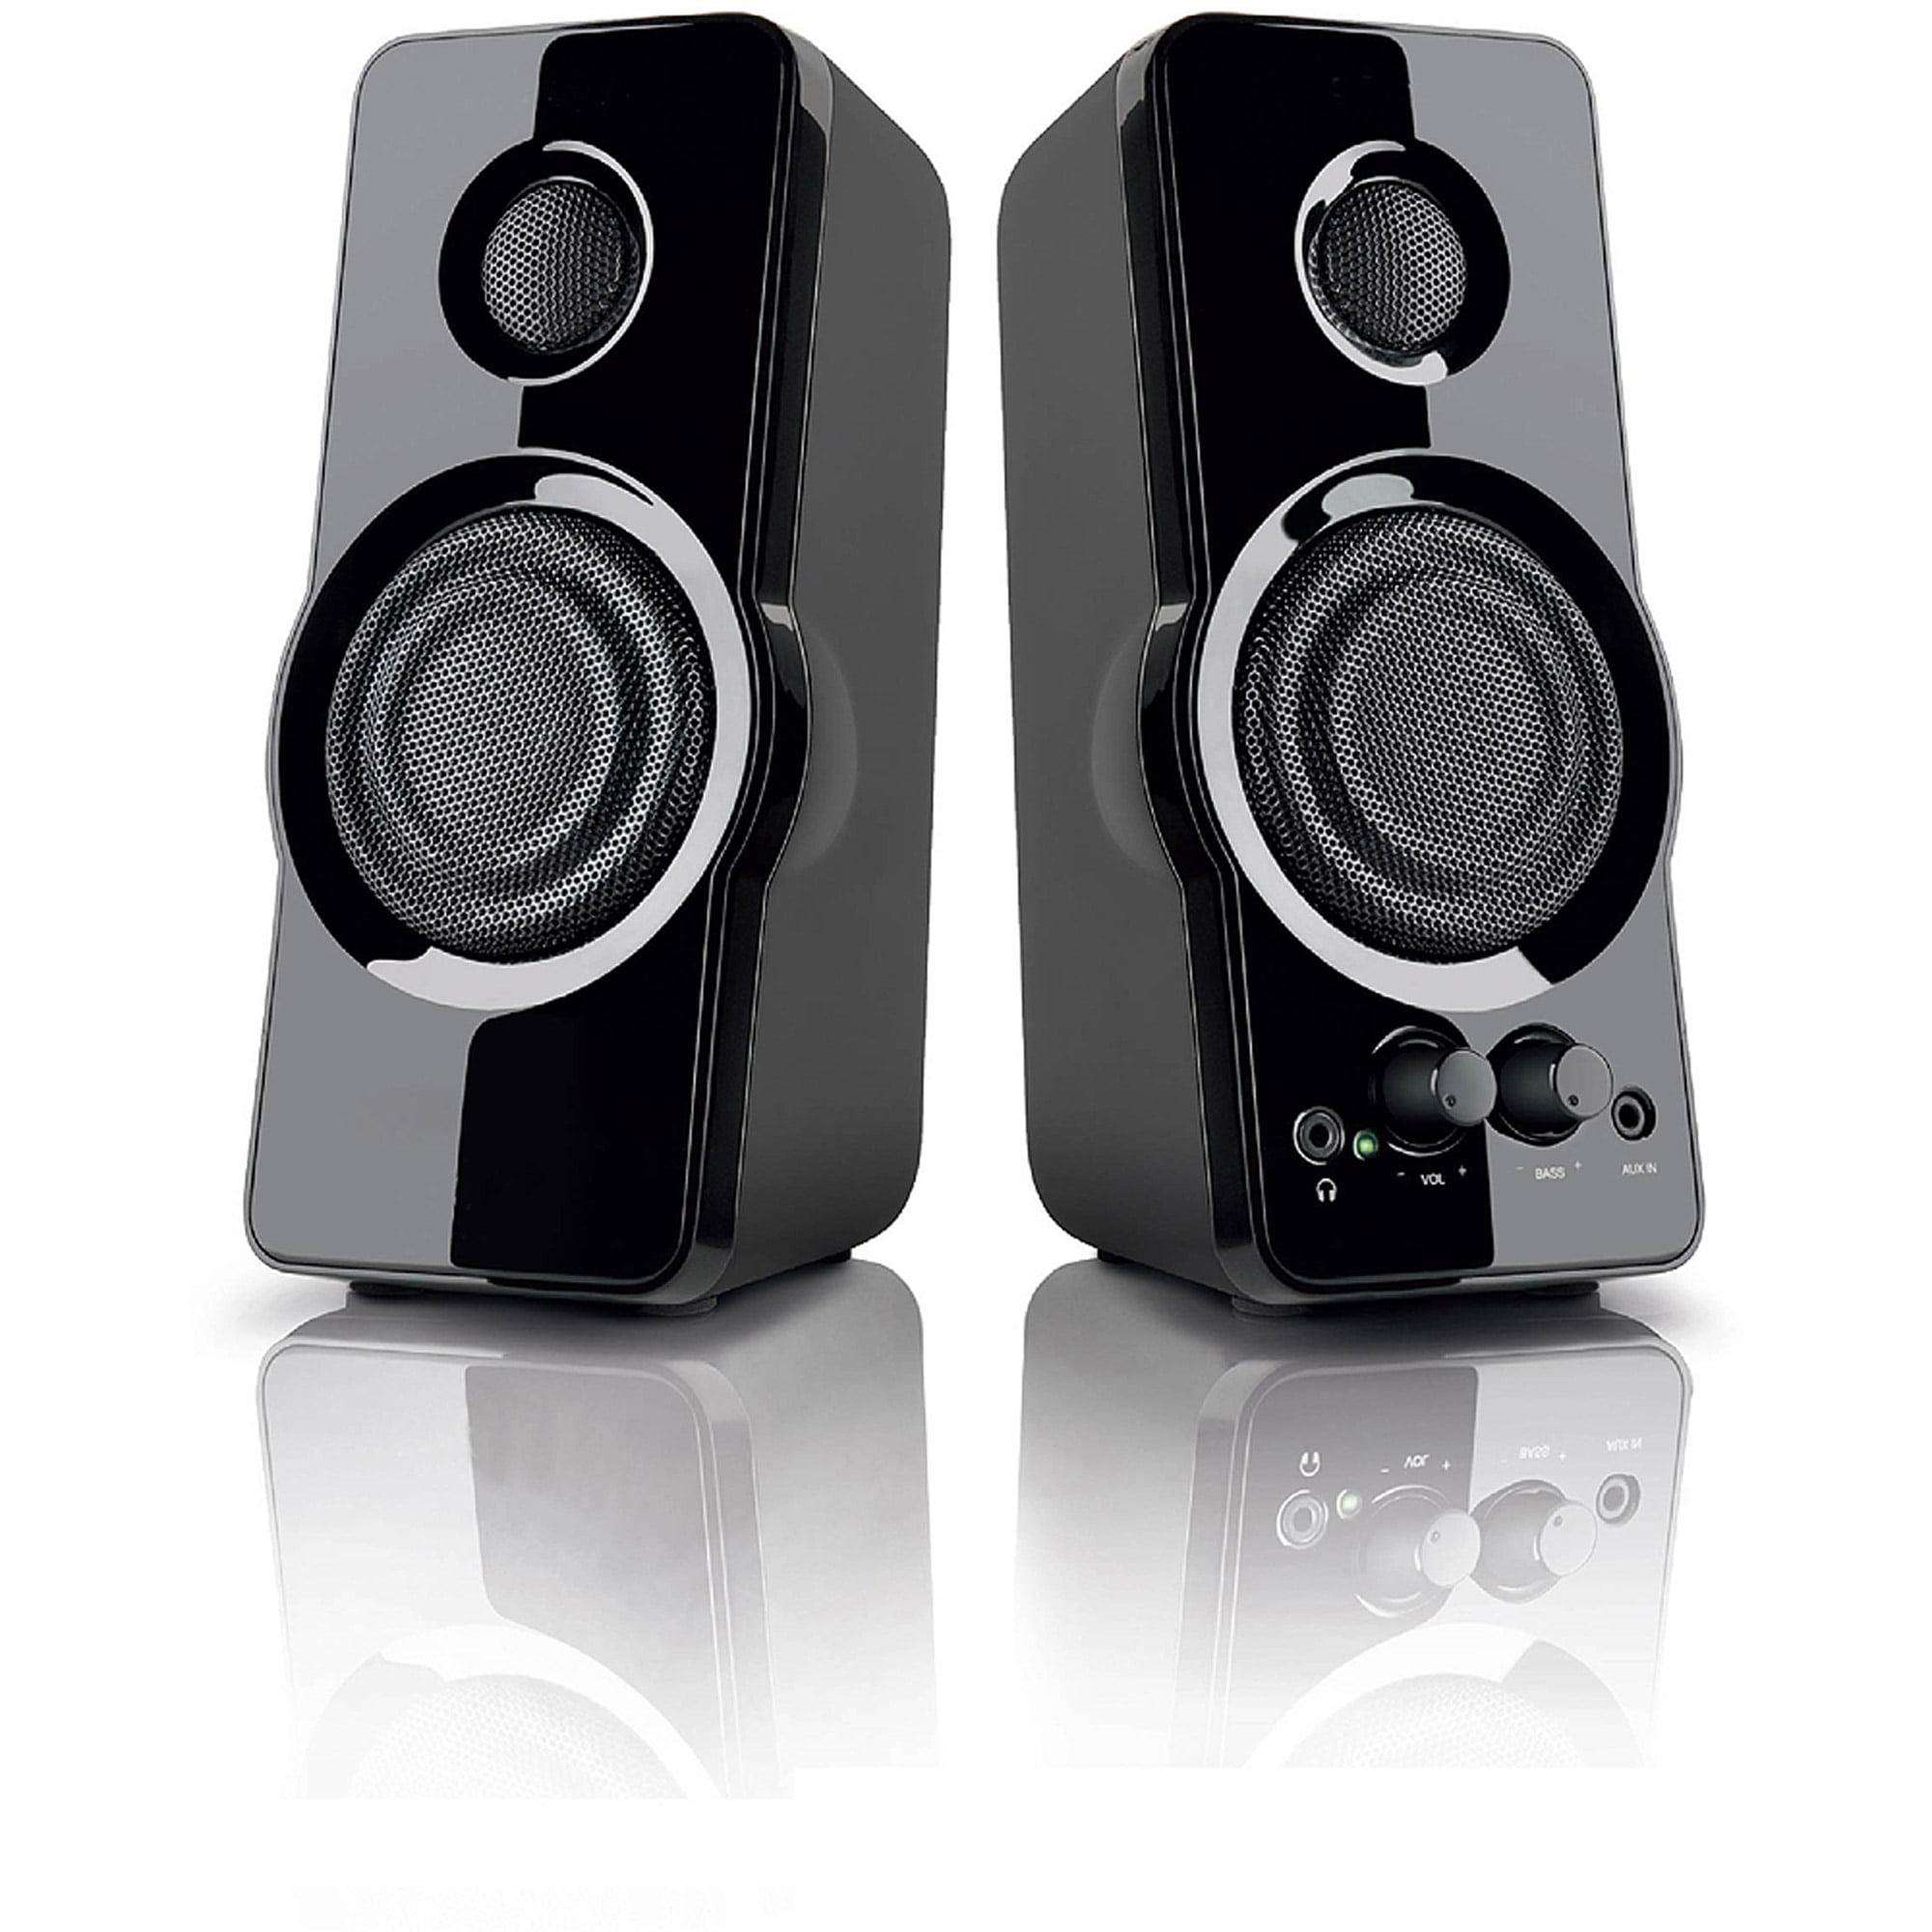 Logitech 980 000012 s120 2 piece black desktop computer speaker set - Logitech 980 000012 S120 2 Piece Black Desktop Computer Speaker Set 22